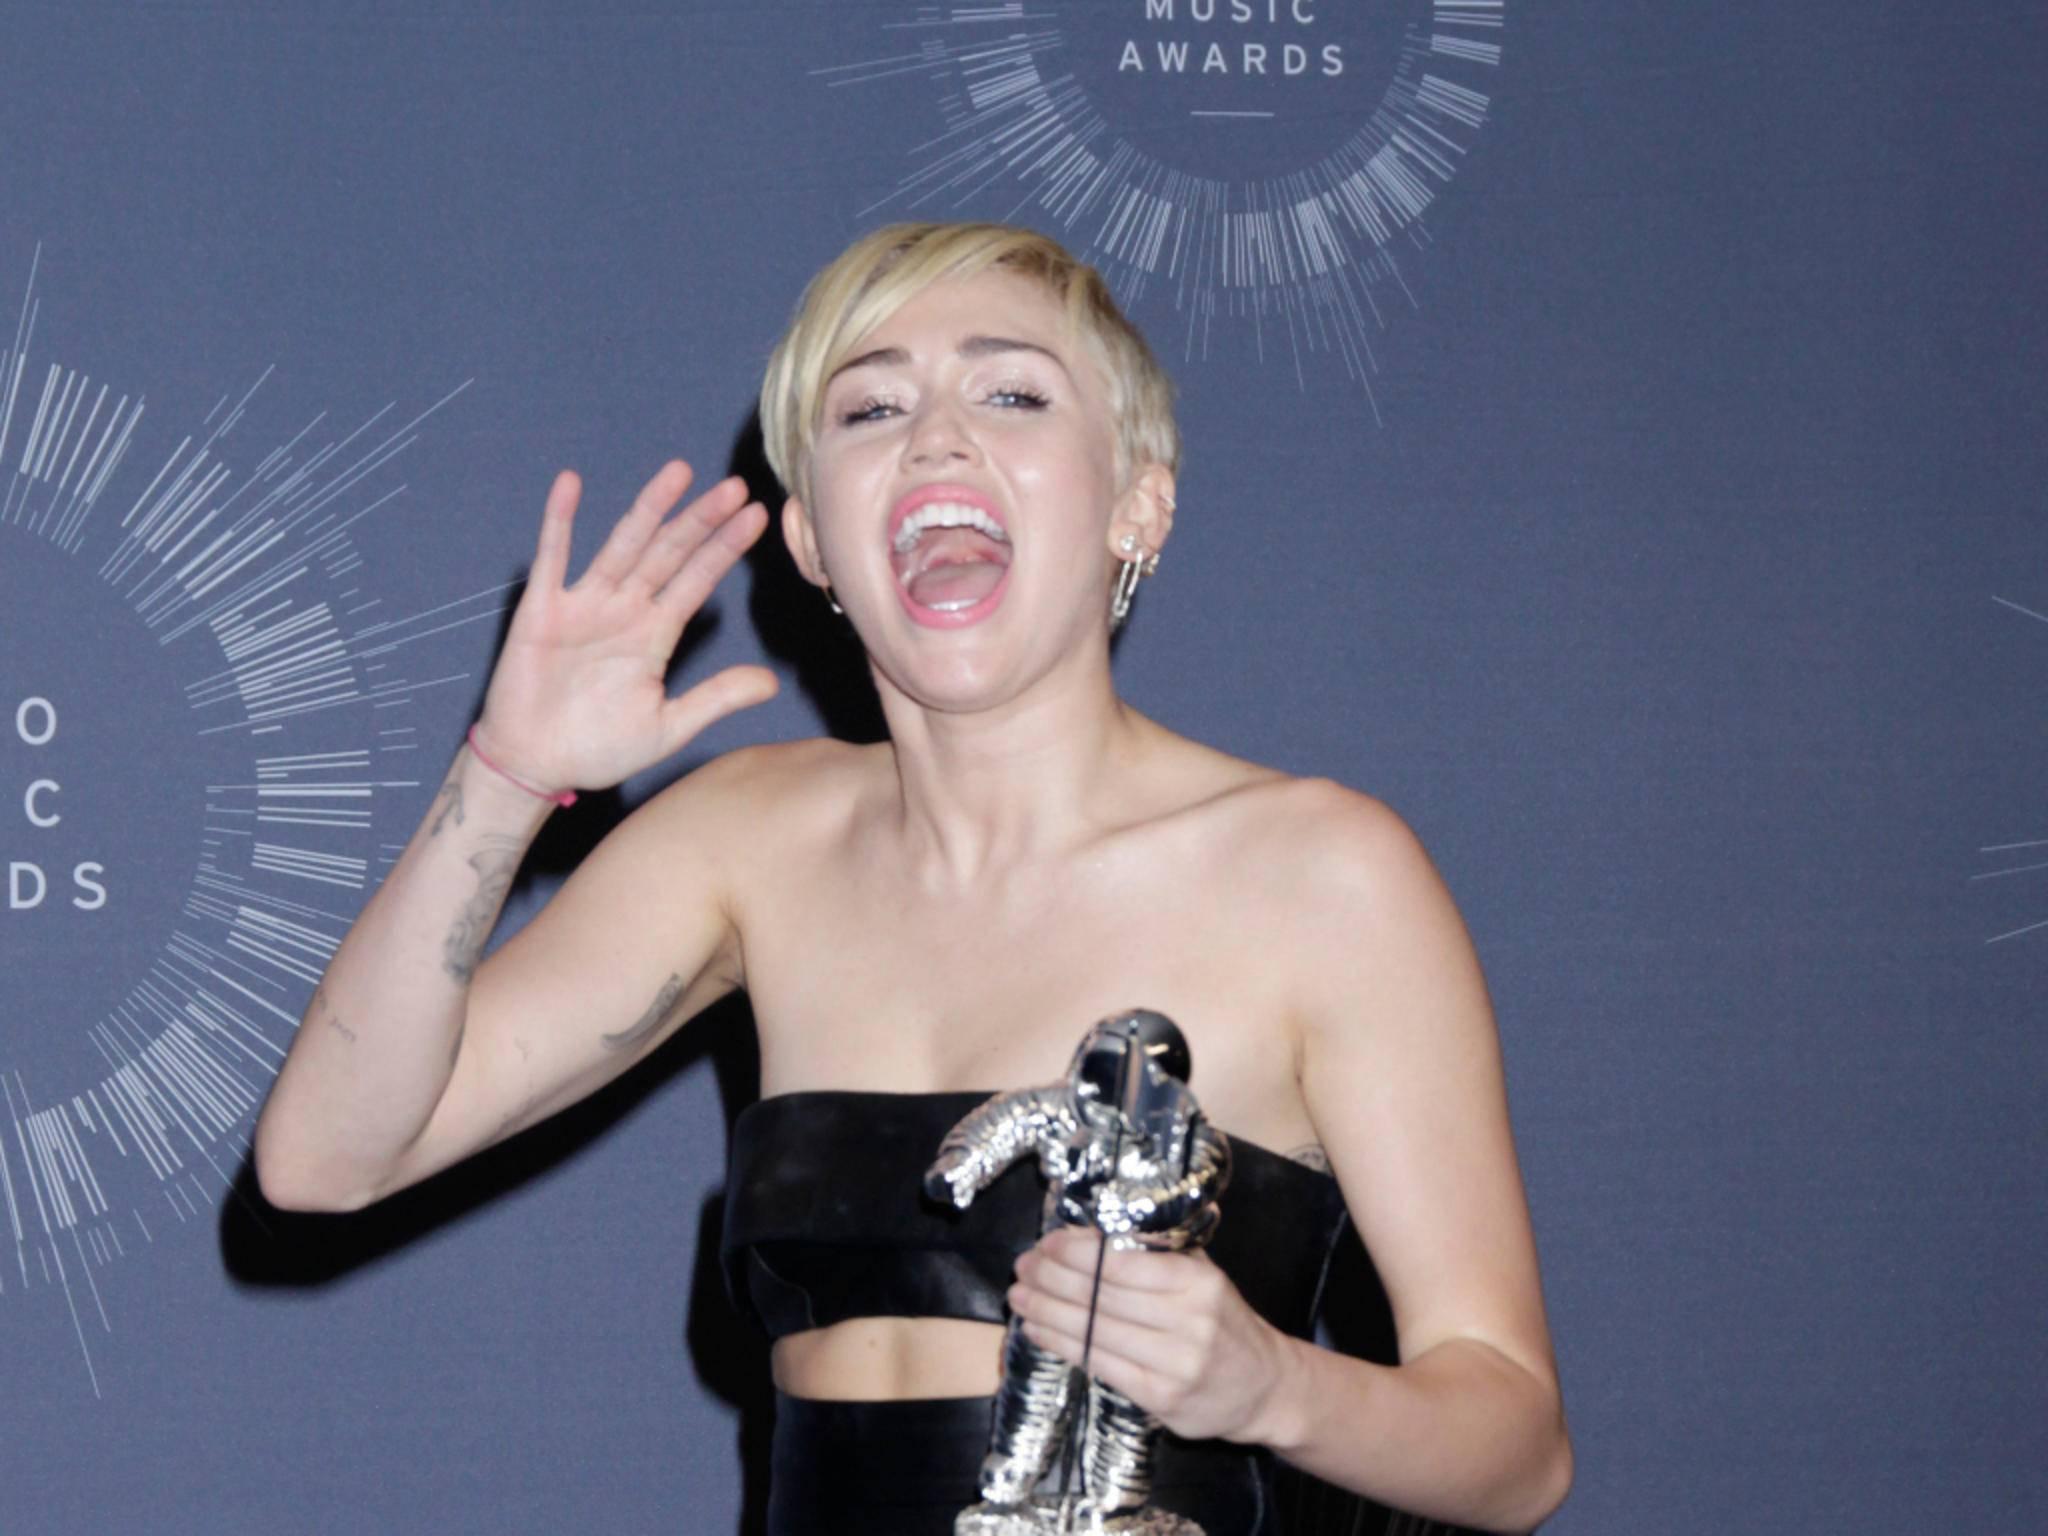 Skandalnudel Miley Cyrus moderiert in diesem Jahr die MTV VMAs.